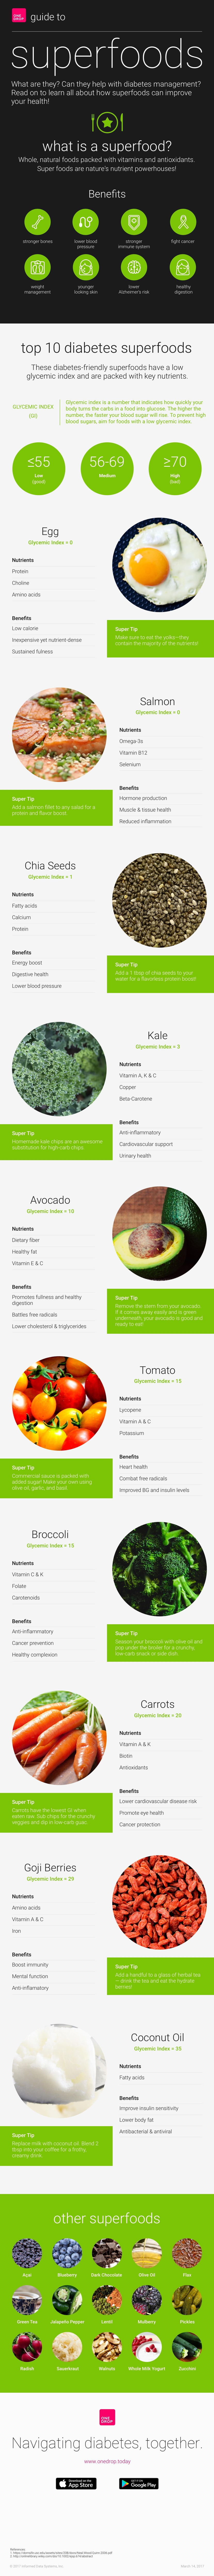 25 Superfoods